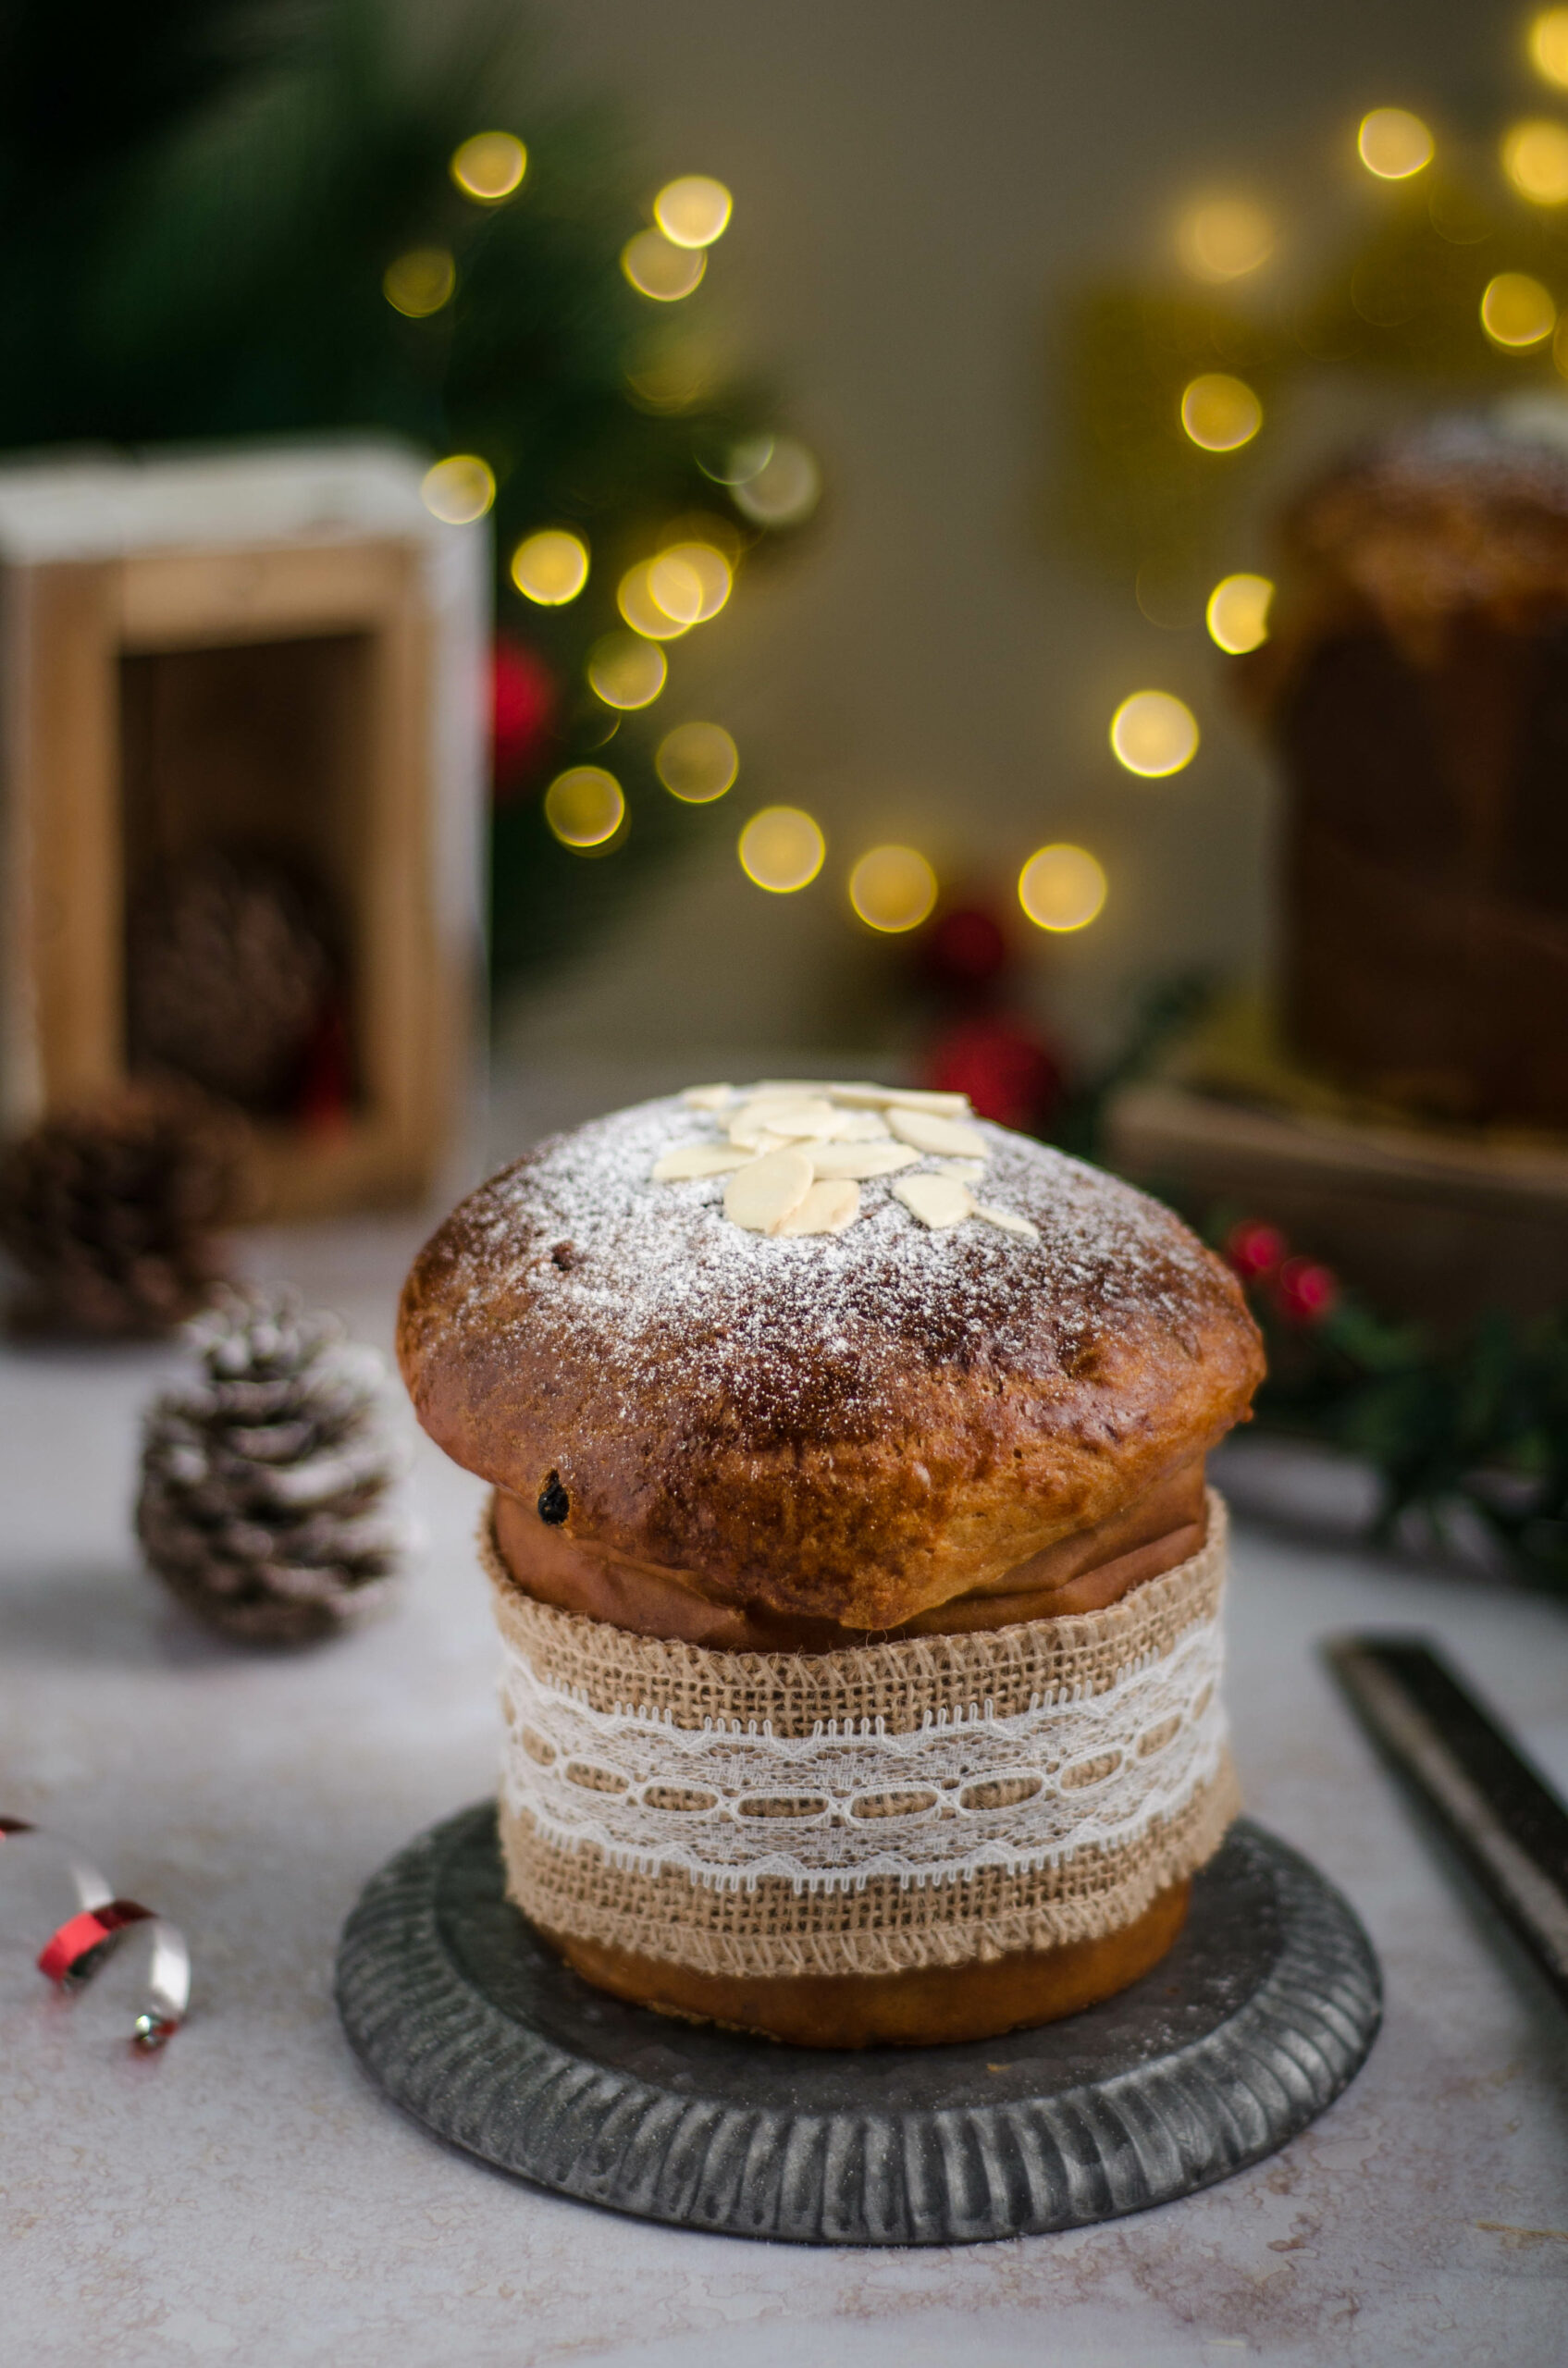 panettone - Italian christmas bread